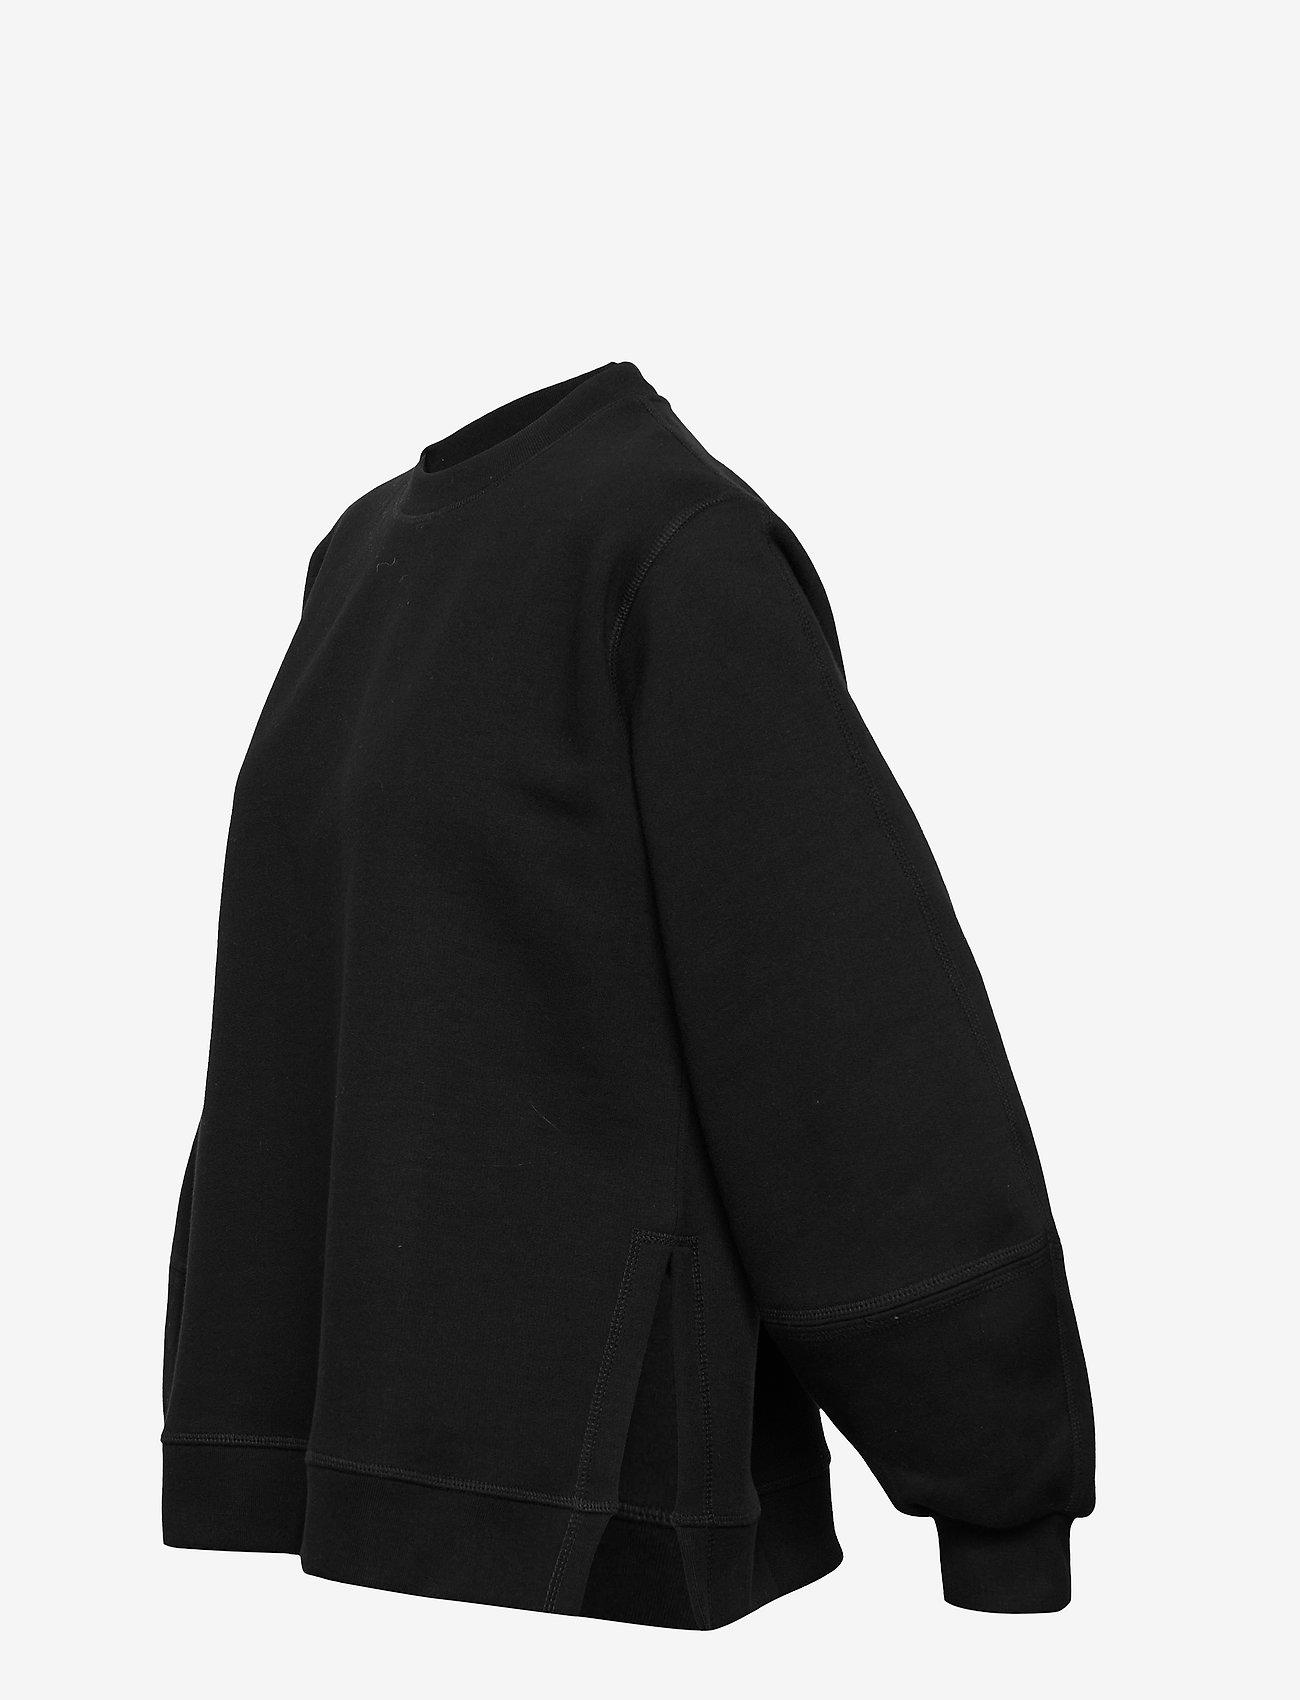 Ganni - Software Isoli - sweatshirts & hoodies - black - 2